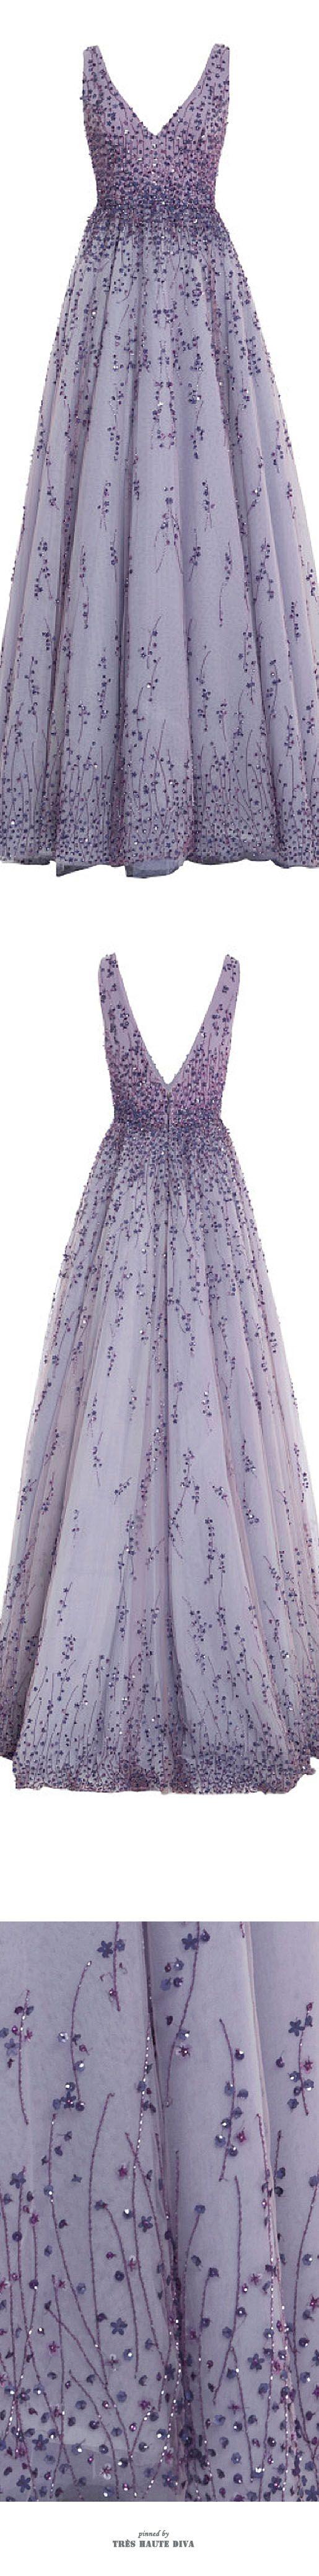 Monique Lhuillier Violet Embroidered Tulle V-Neck Ball Gown ♔ SS 2015 ♔ Très Haute Diva ♔